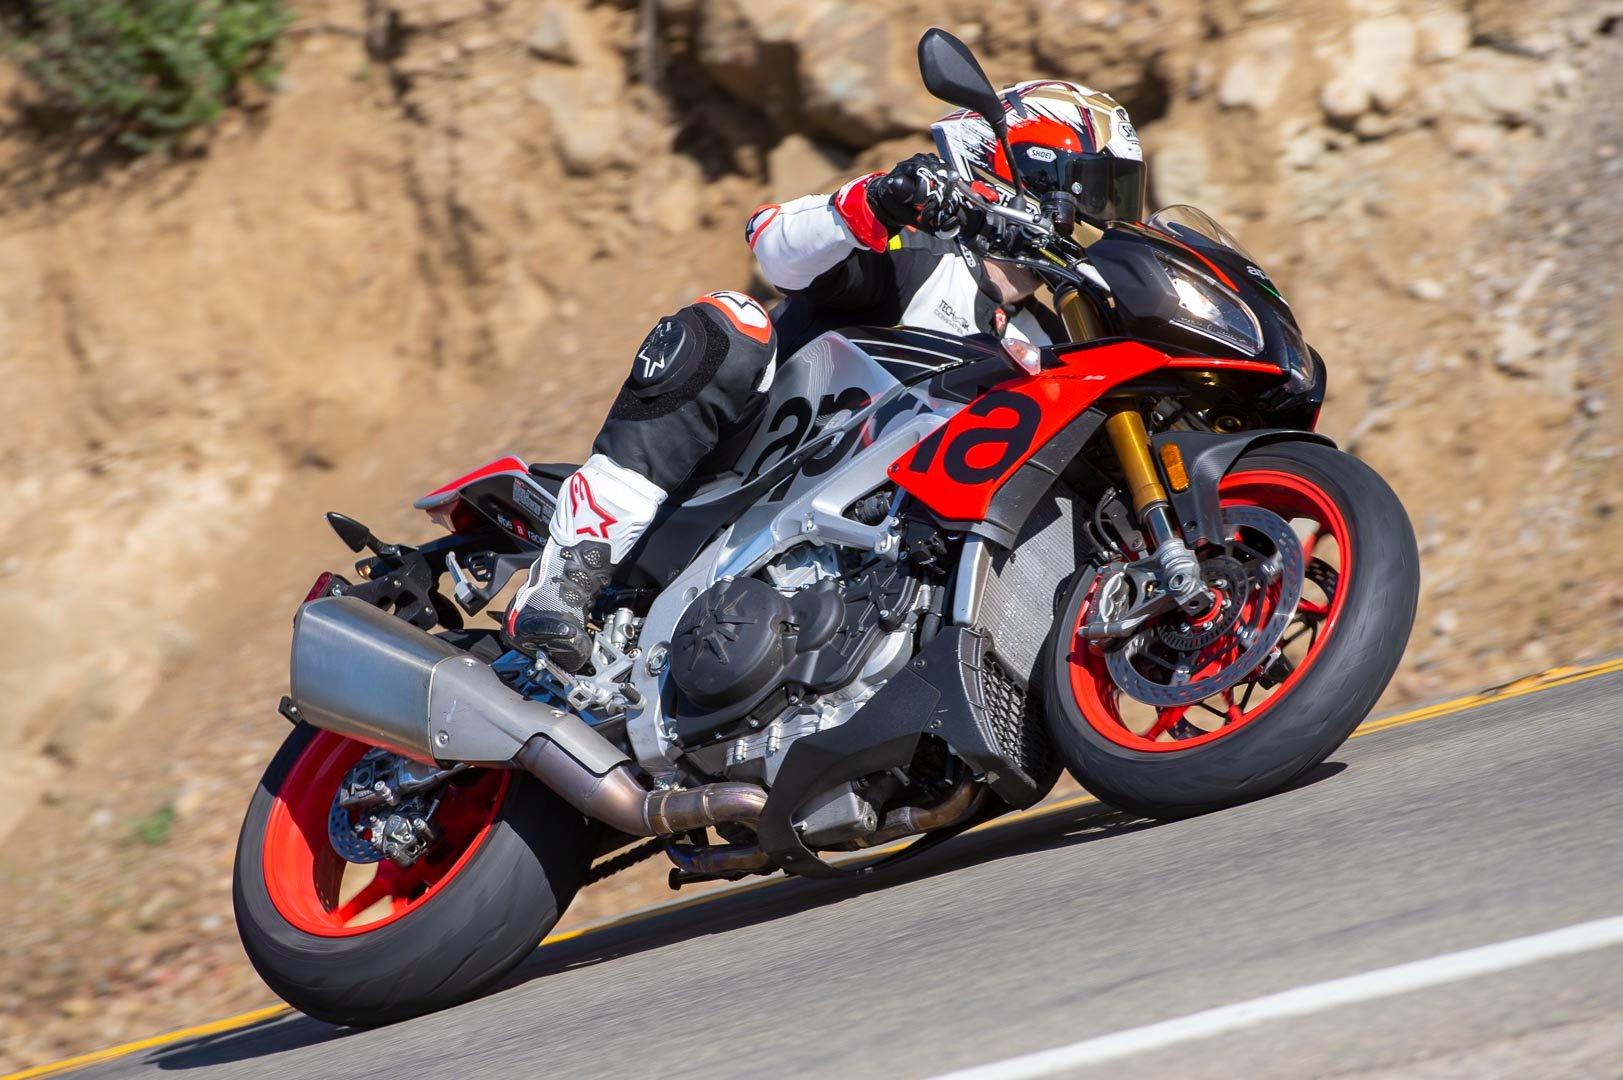 2019 Aprilia Tuono V4 1100 Factory Review Upright Superbike